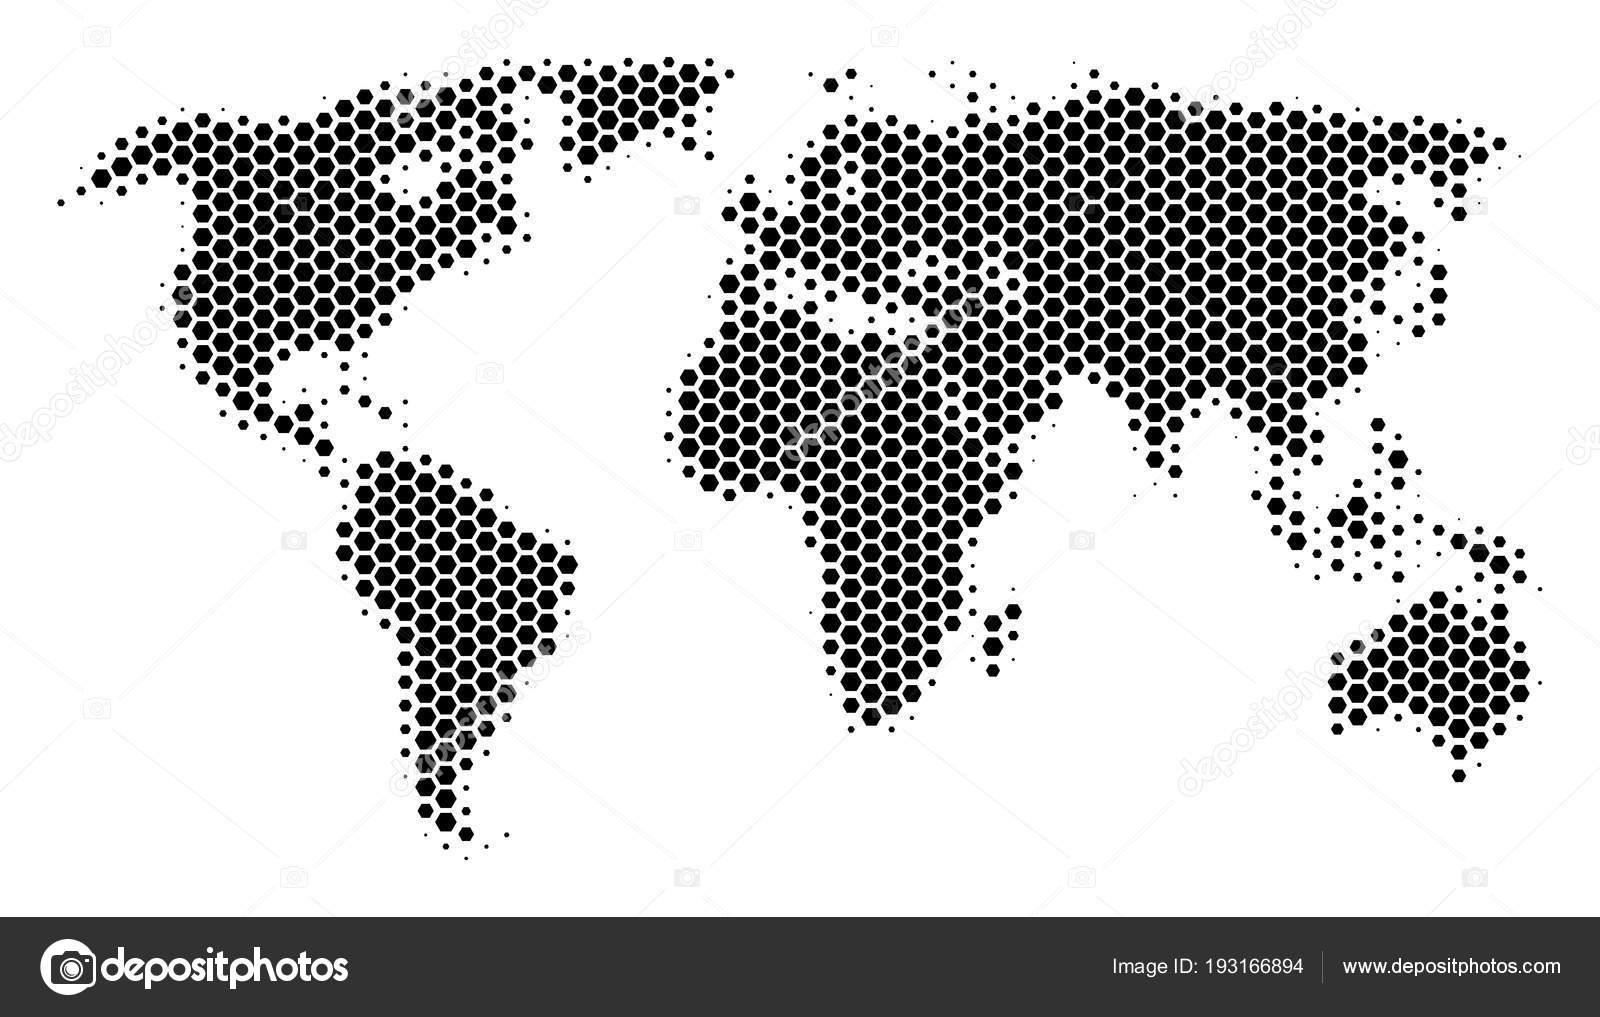 Hexagon halftone world map stock vector ahasoft 193166894 hexagon halftone world map stock vector gumiabroncs Gallery